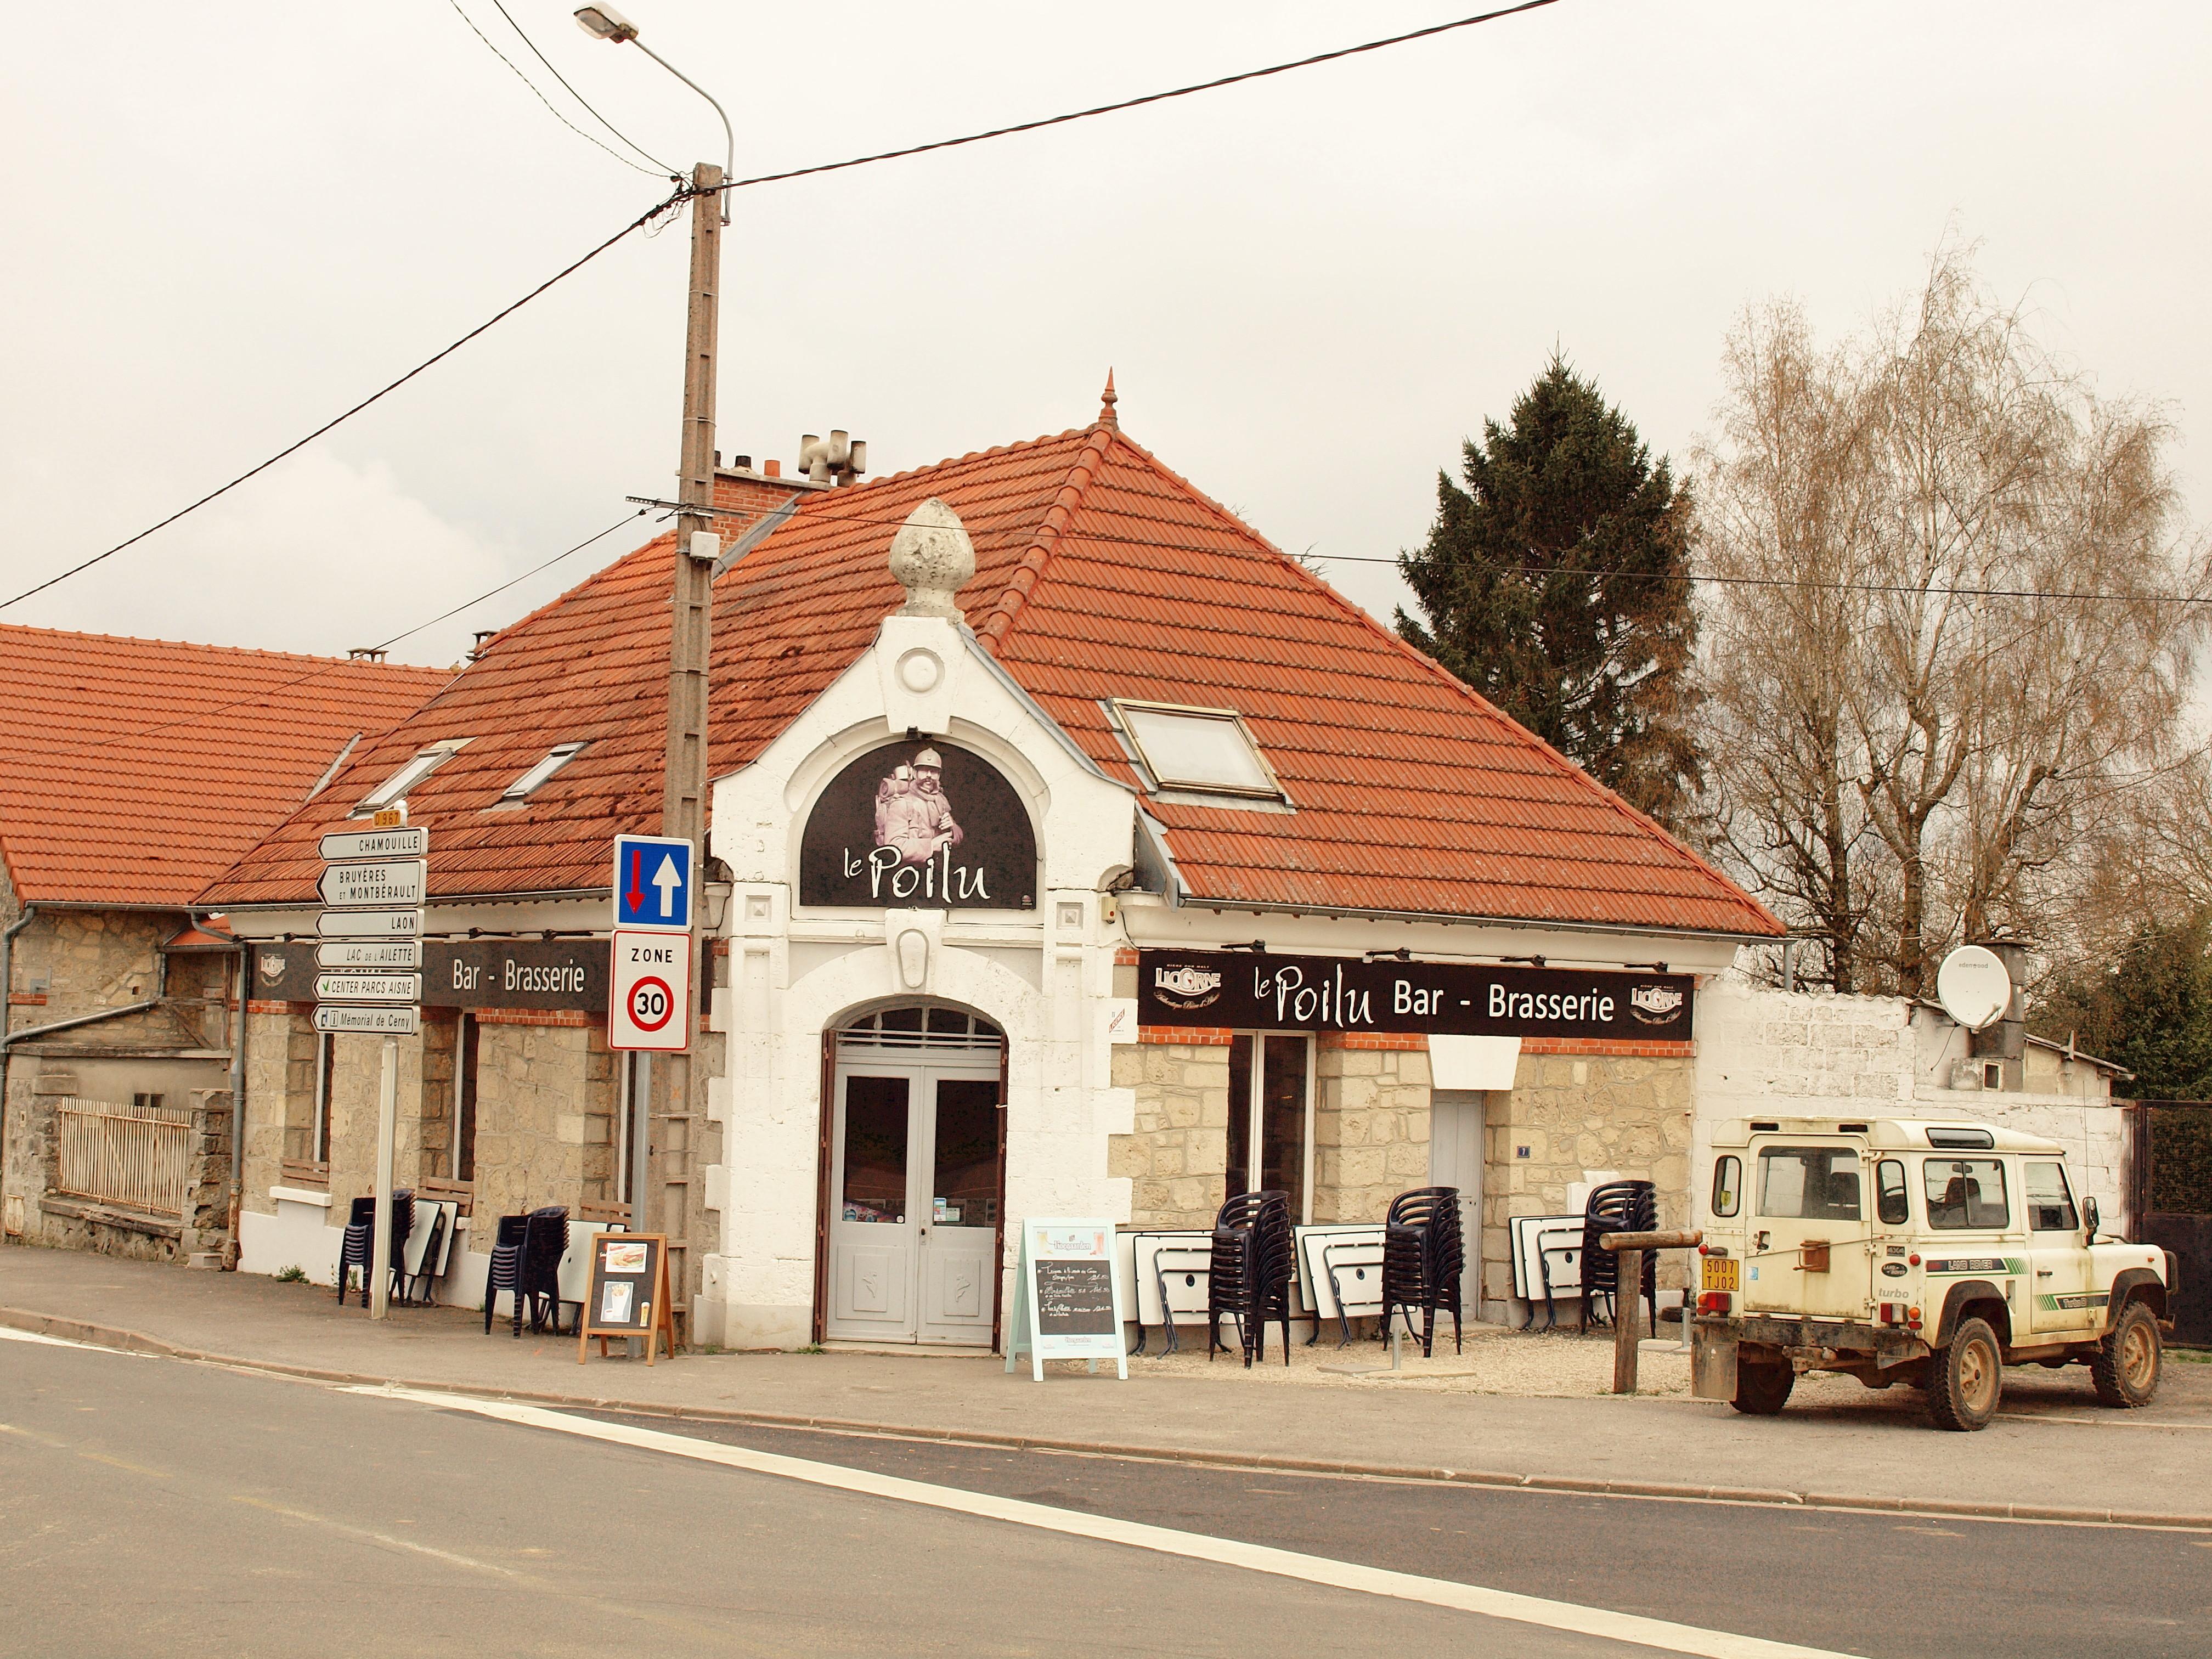 cerny-en-laonnois-fr-02--bar_brasserie_le_poilu-02.jpg